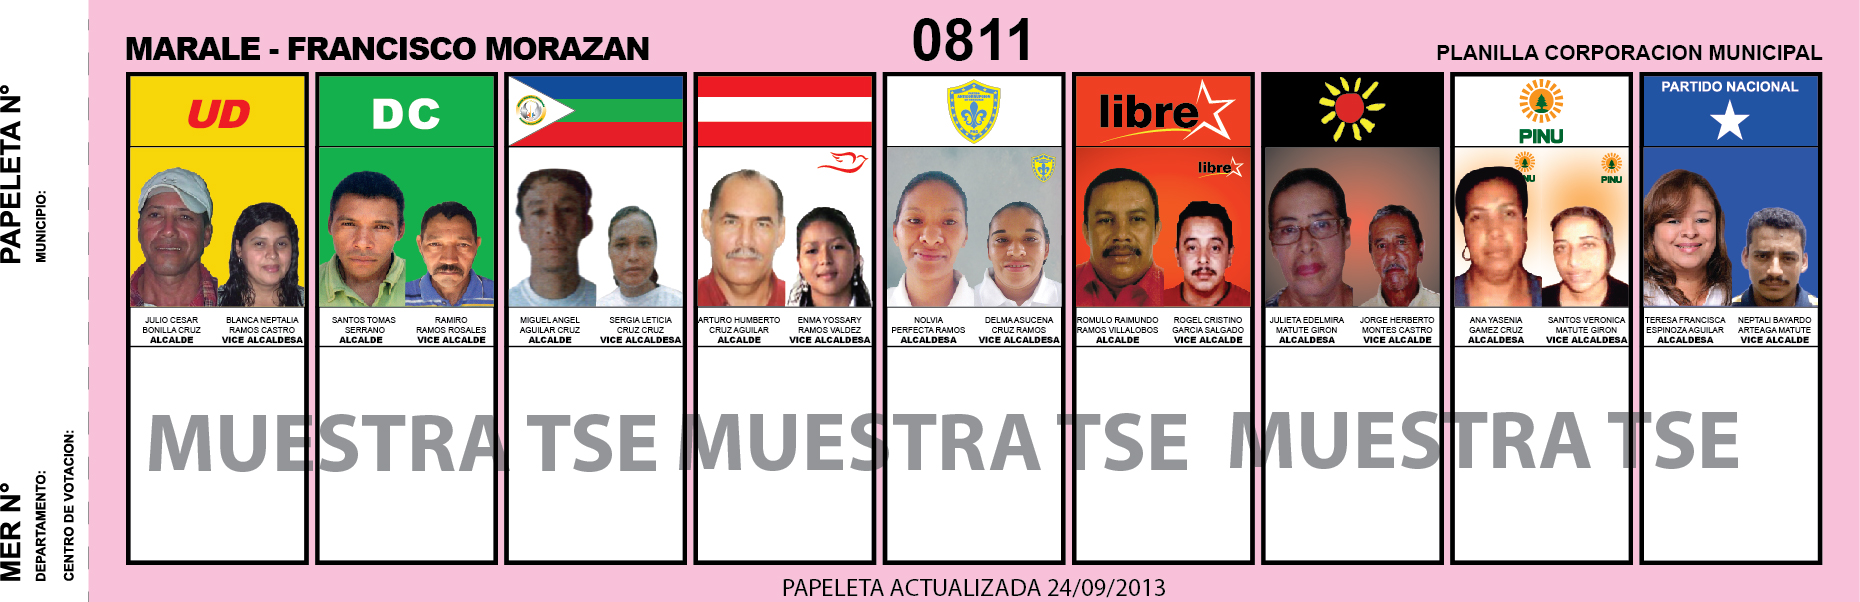 CANDIDATOS 2013 MUNICIPIO MARALE - FRANCISCO MORAZAN - HONDURAS